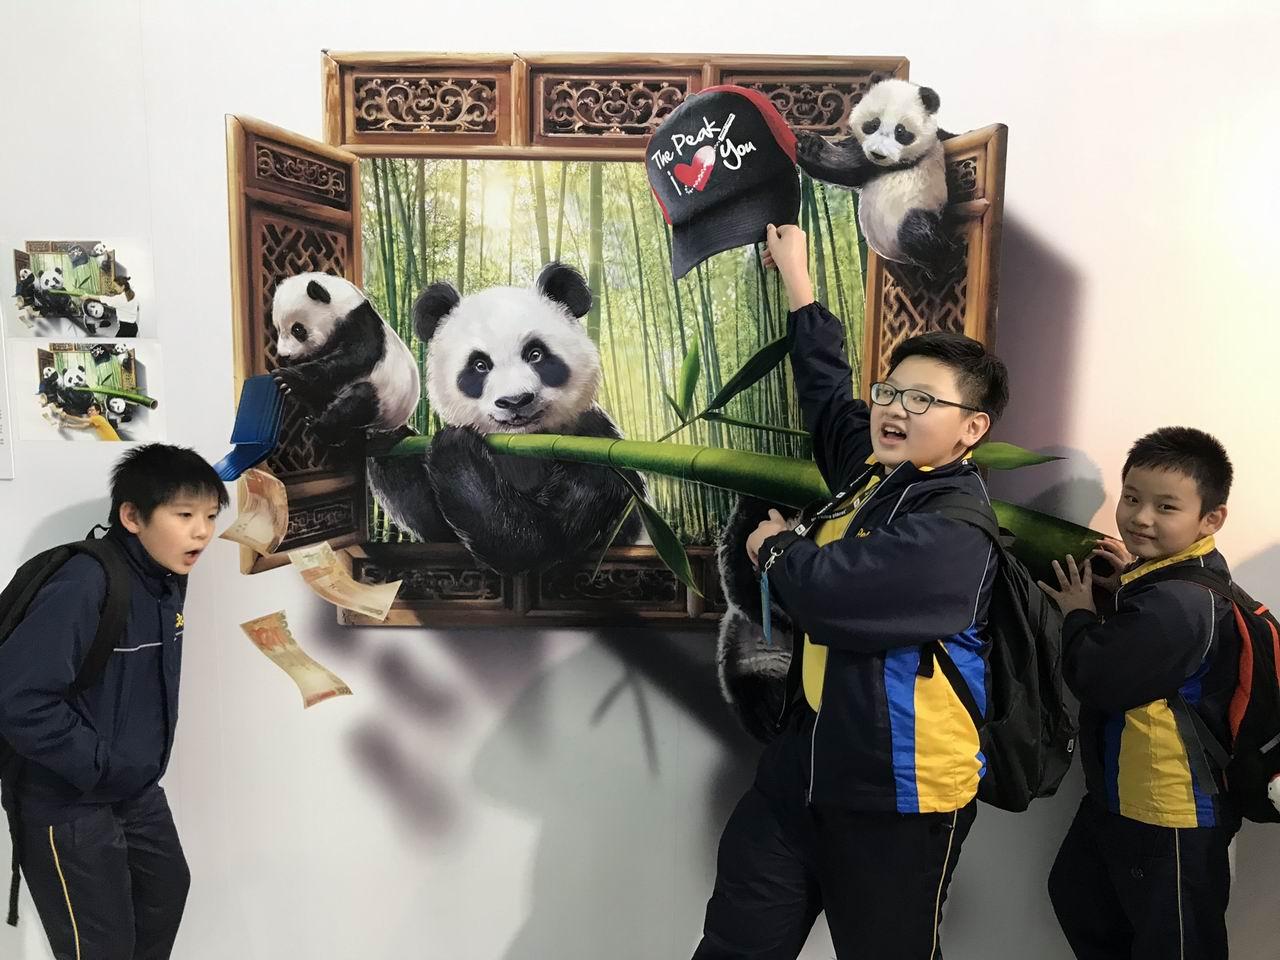 https://plkcjy.edu.hk/sites/default/files/img_2739.jpeg